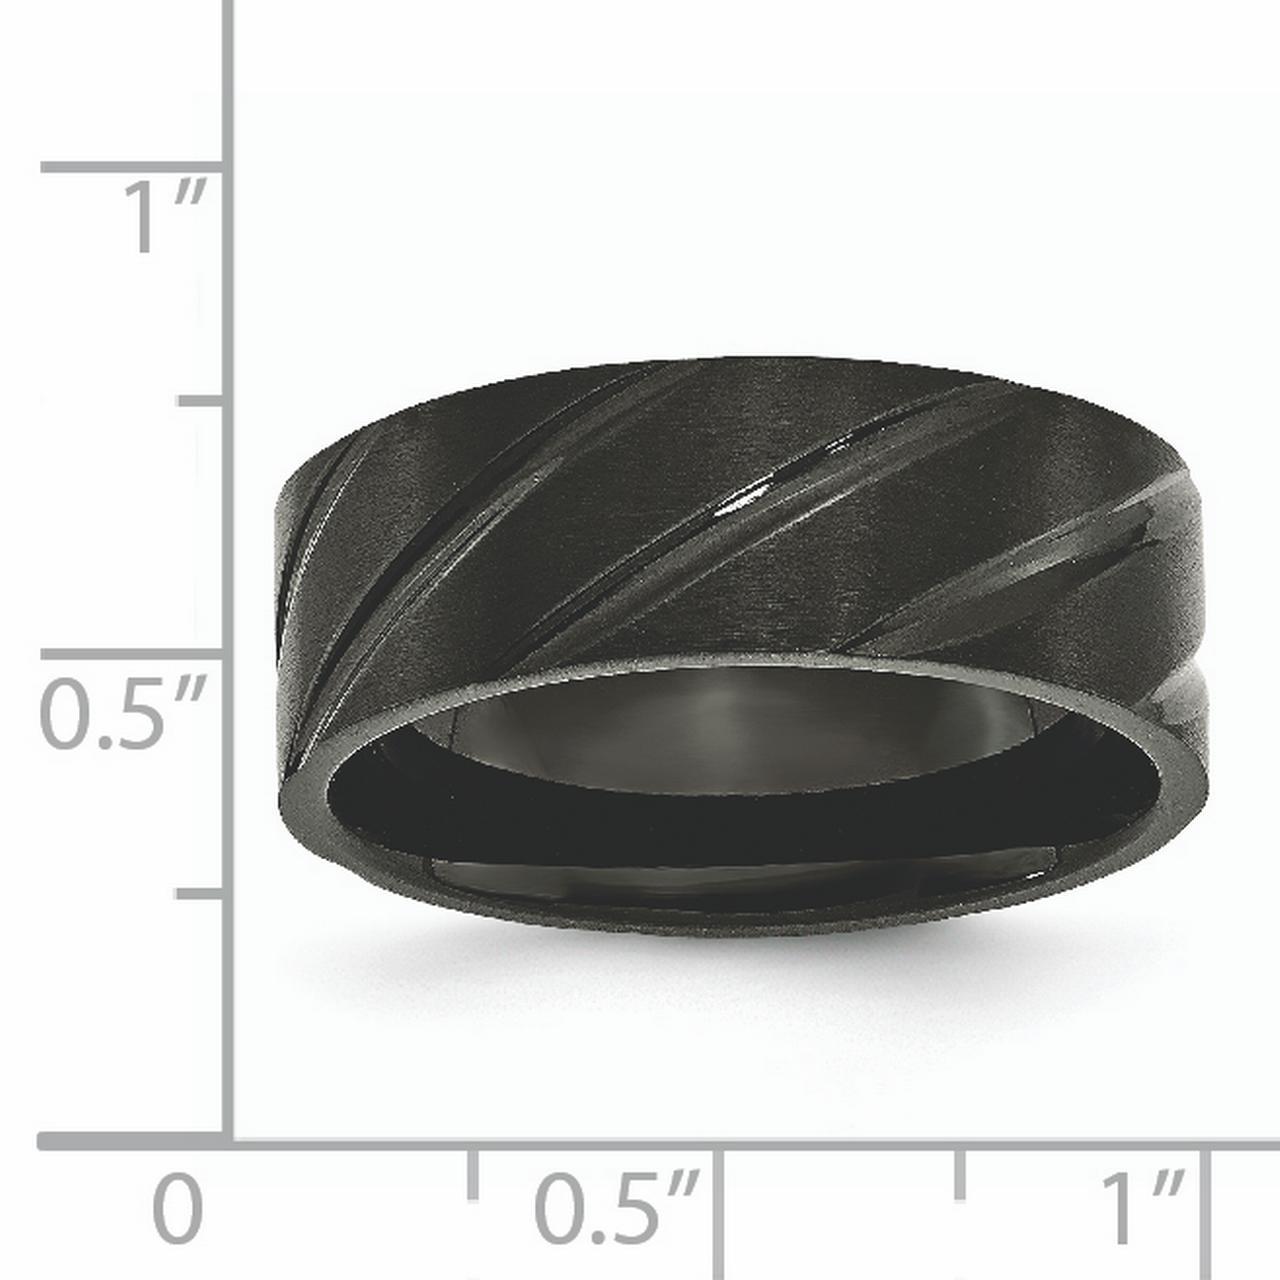 Bridal Wedding Bands Fancy Bands Titanium 6mm Black IP-plated Swirl Brushed and Polished Band Size 8